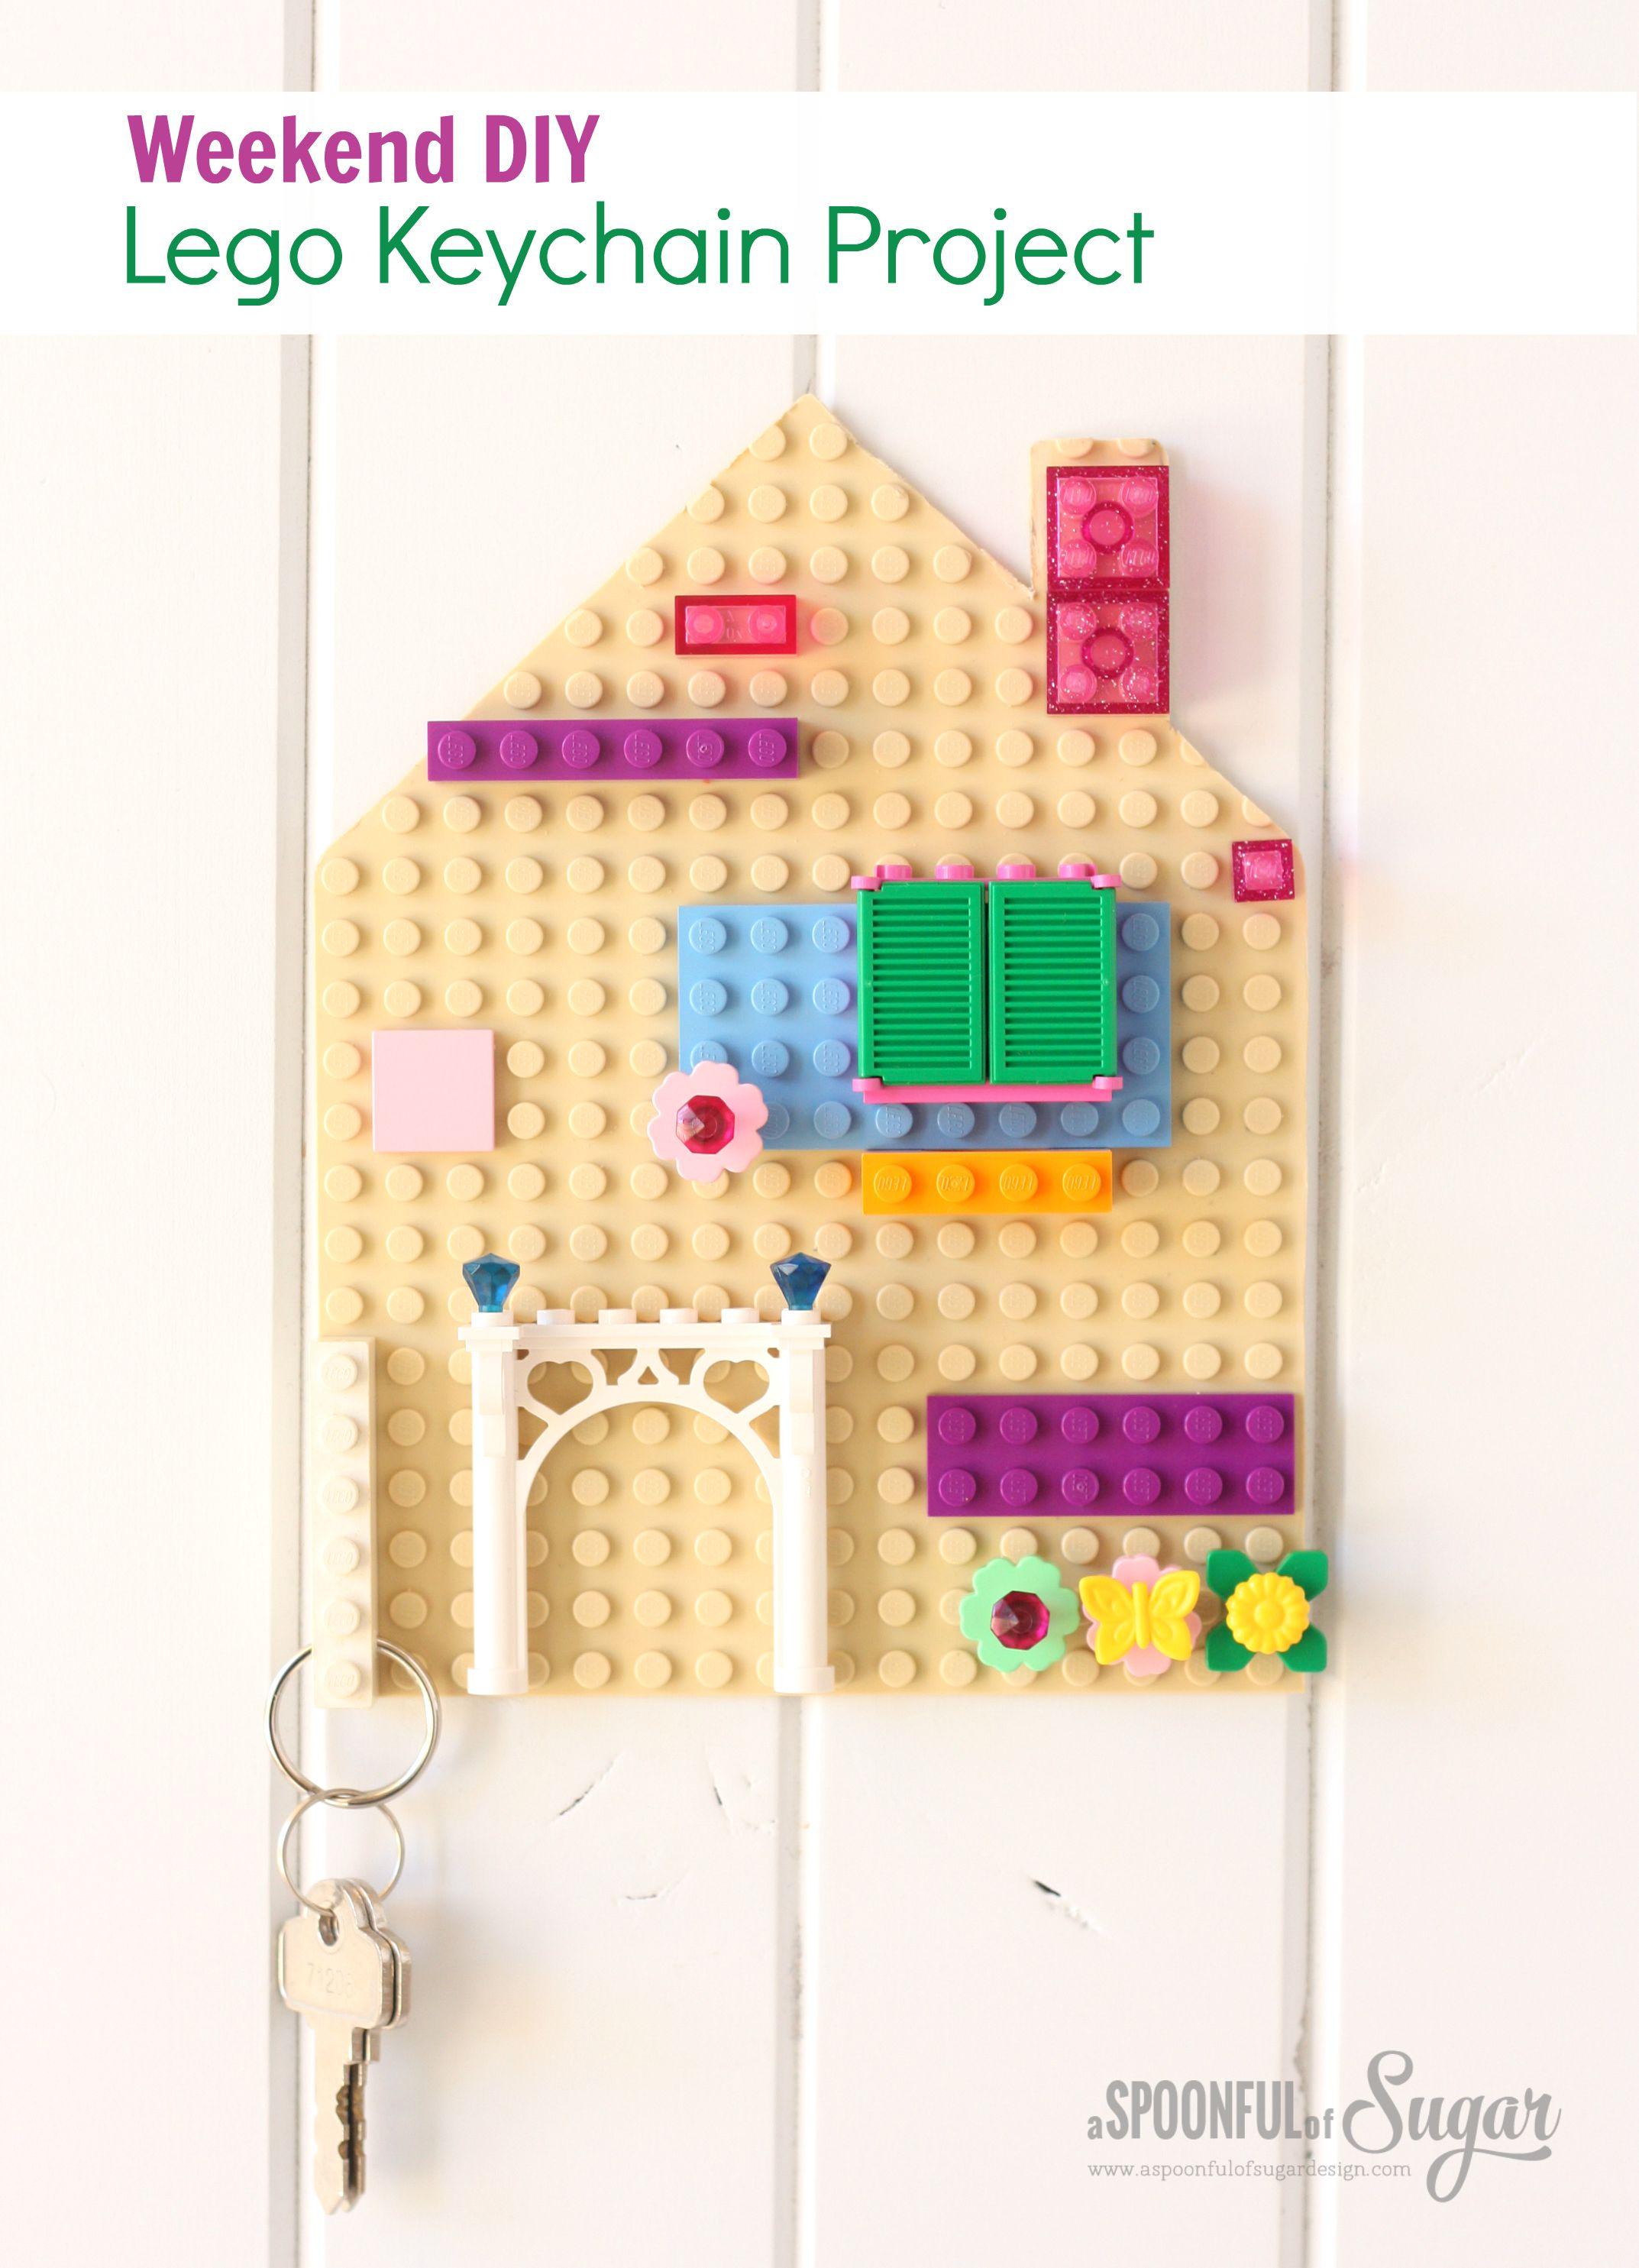 Lego-Keychain-Project